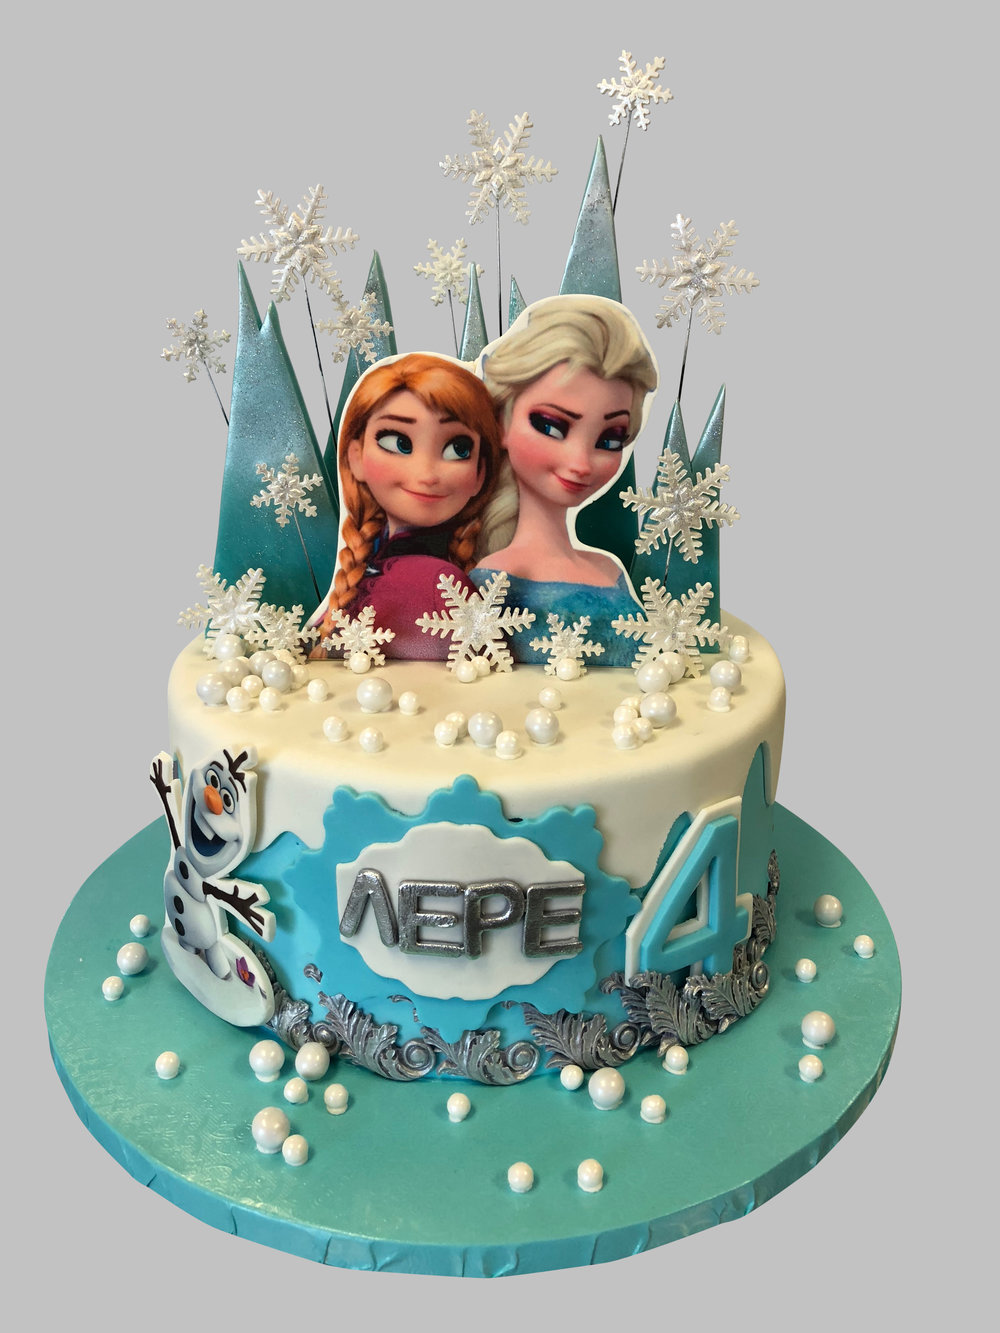 Frozen Theme Birthday Cake New Jersey